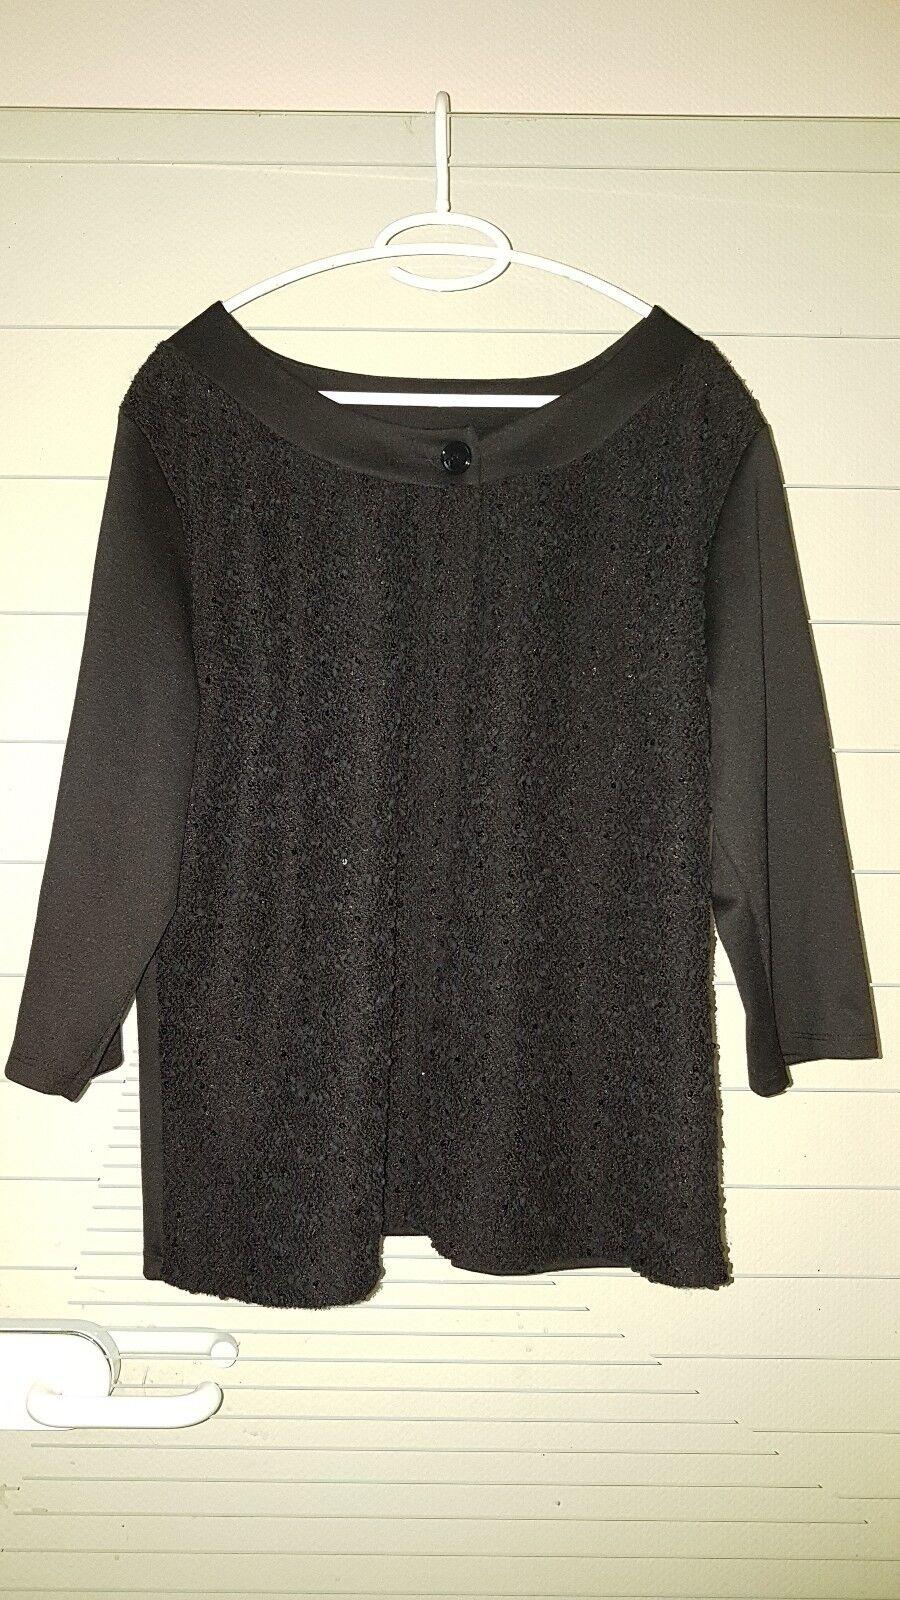 Ladies Top/Blazer/Shirt/Evening Wardrobe Festive Black Size L